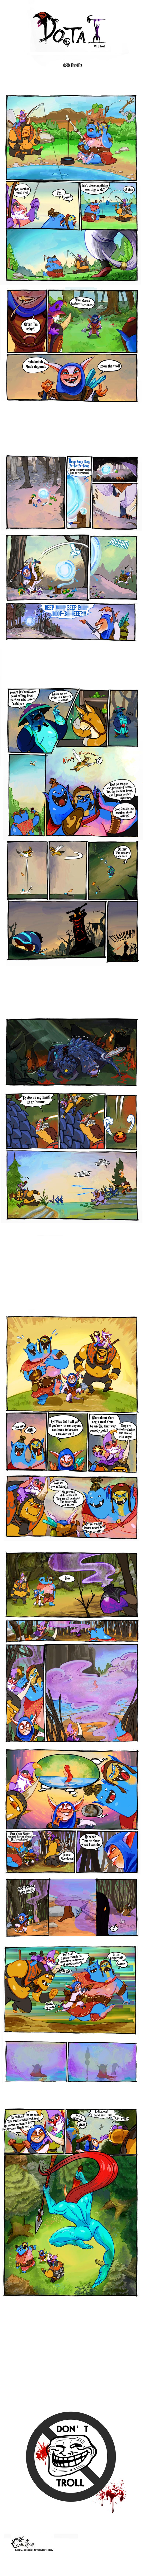 Docta 2: (6) Trolls by xofks12